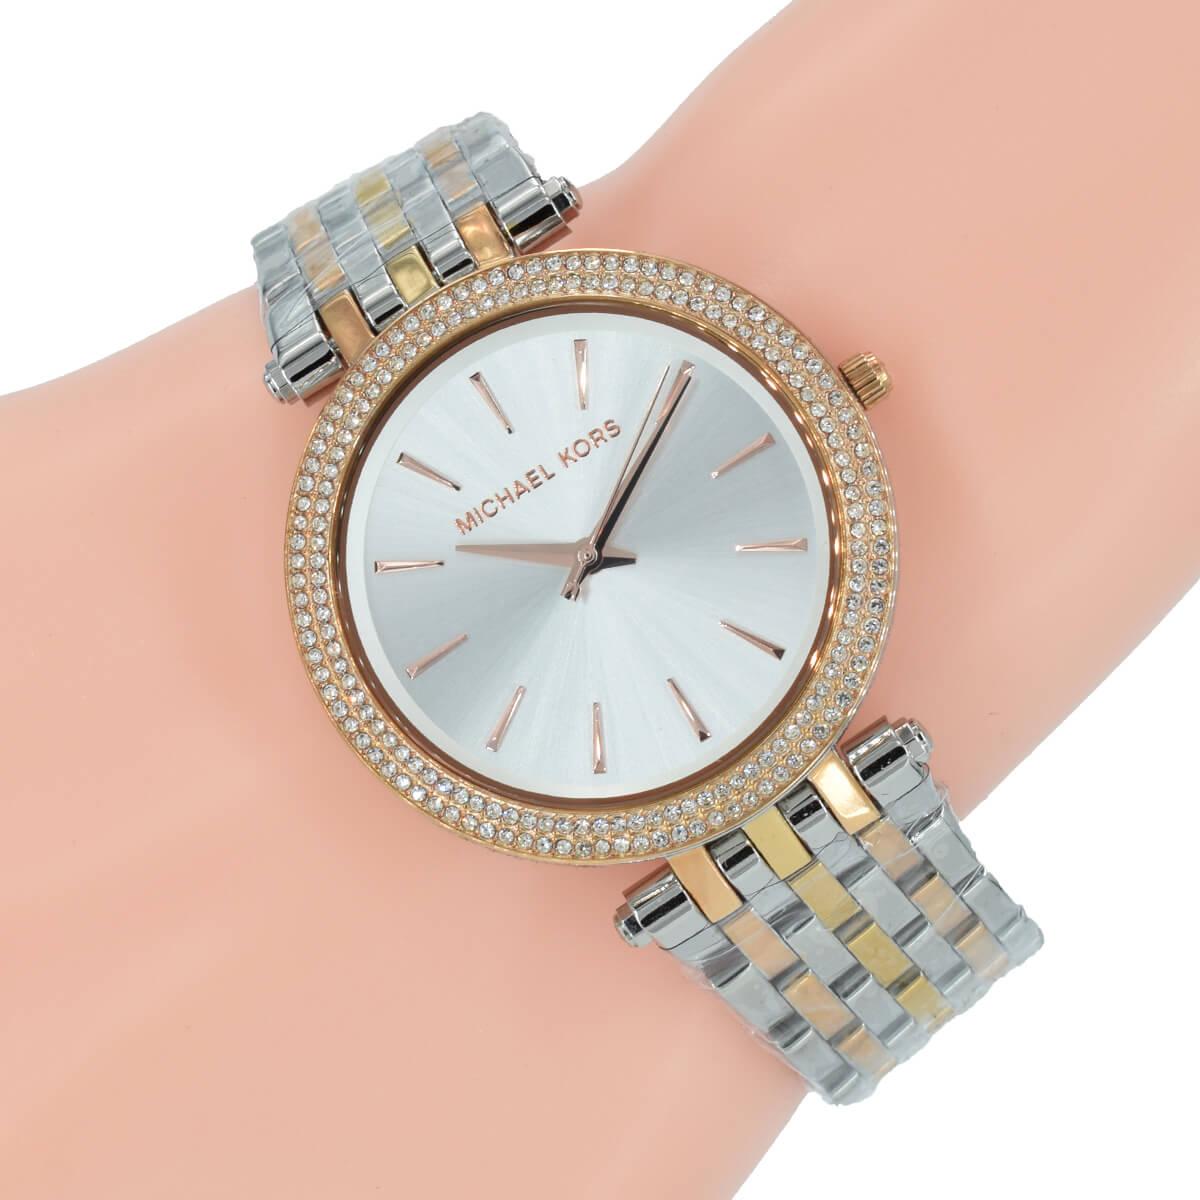 Rose Damen Uhr Michael Darci Tri Color Kors Mk3203 Gold Edelstahl Silber QBxroedECW